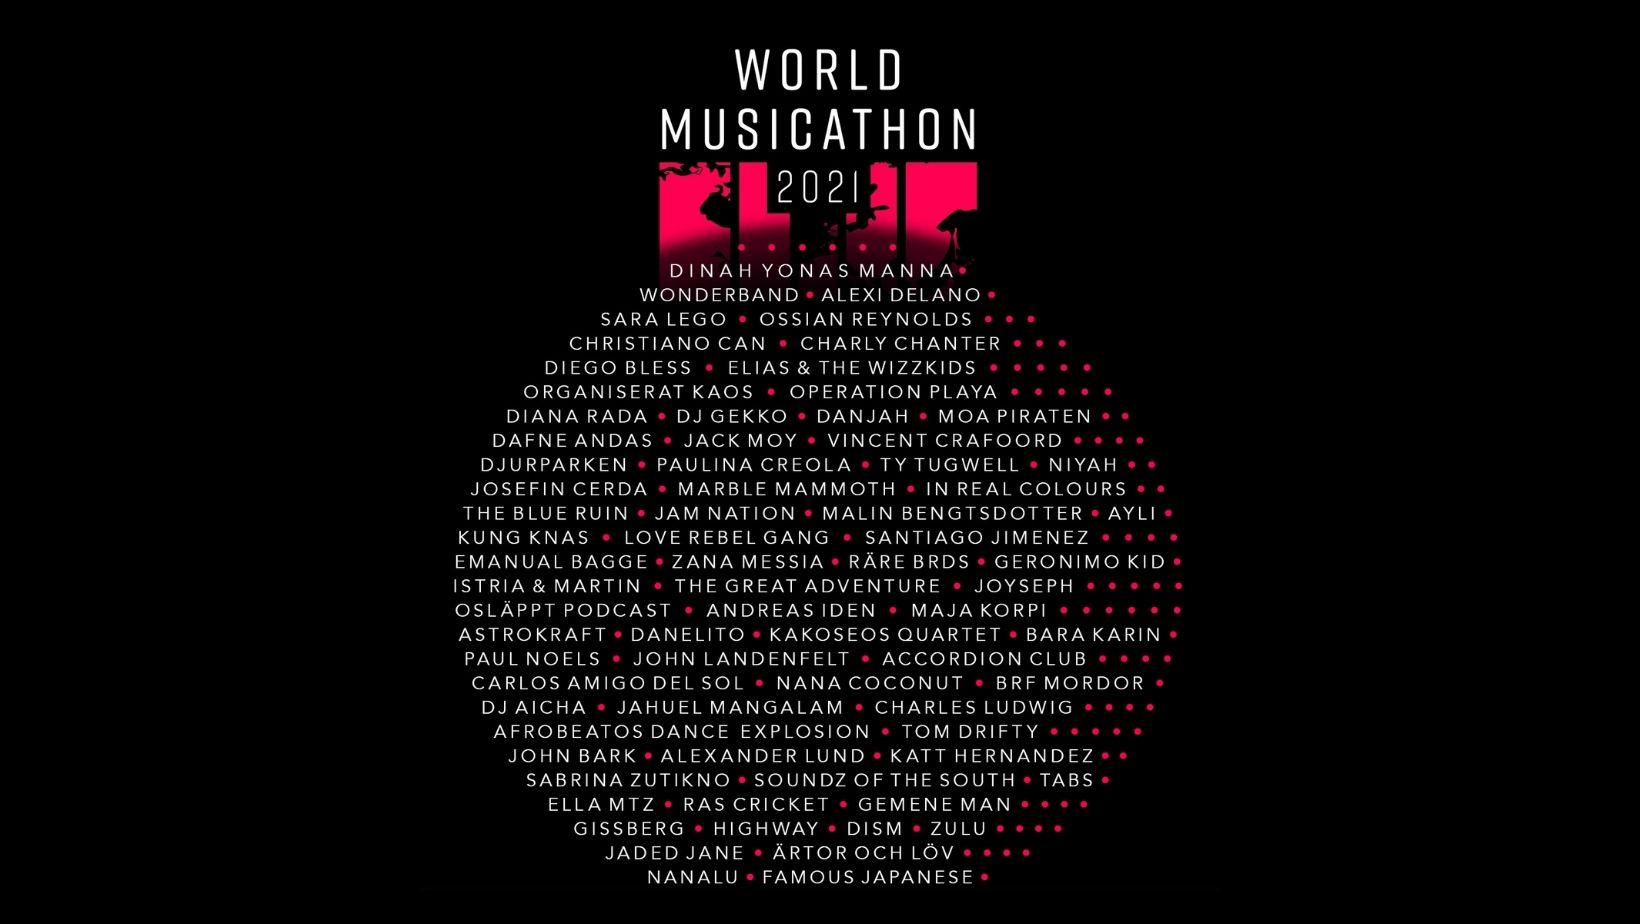 Kajsa Larsson at World Musicathon 2021 6 june 12pm